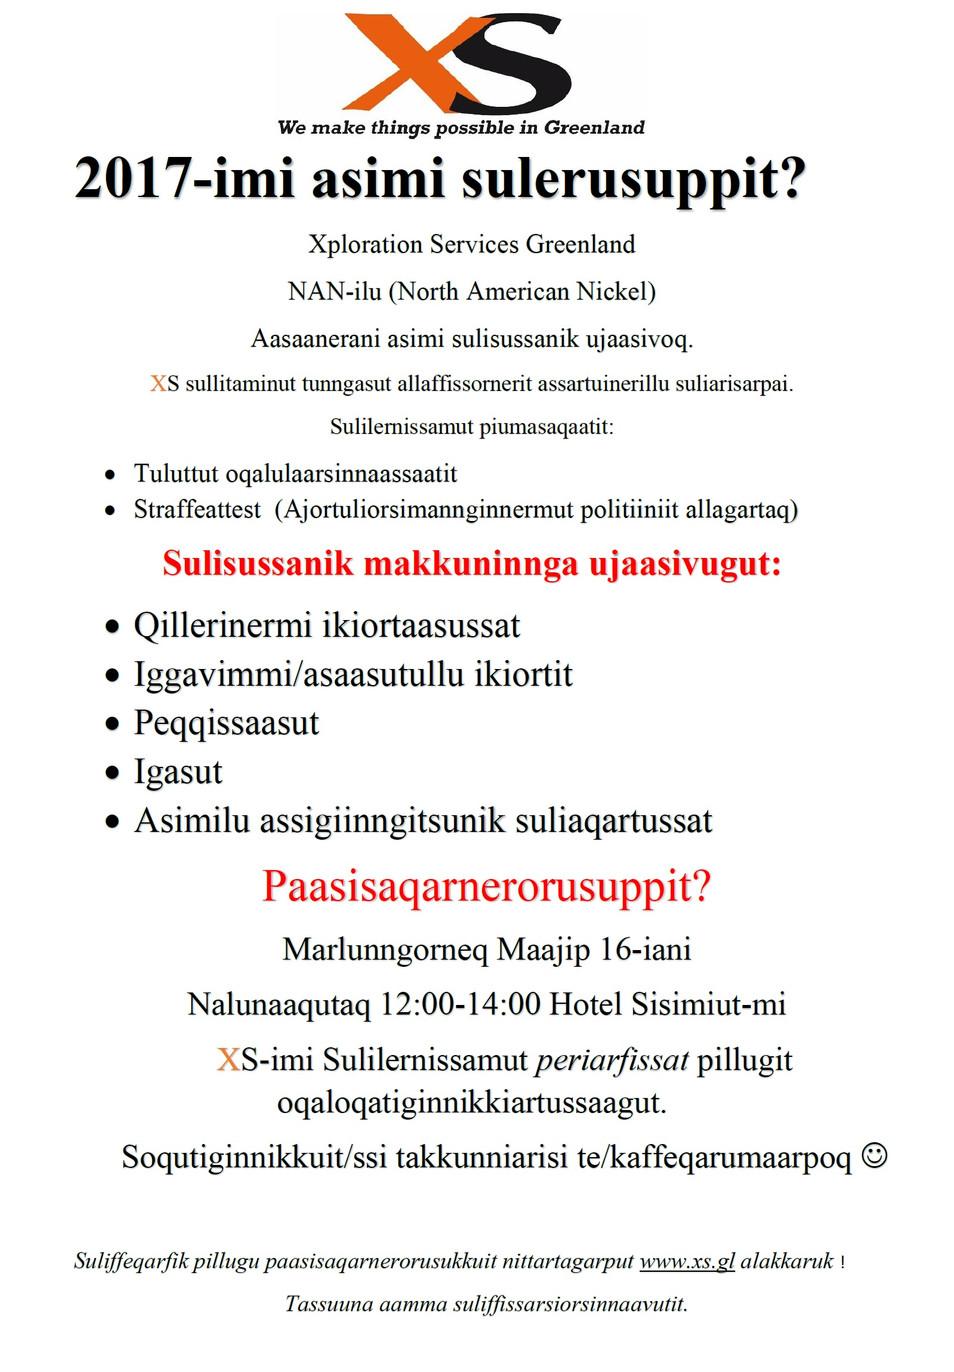 Xploration Services Greenland NAN-ilu Aasaanerani asimi sulisussarsiorpoq